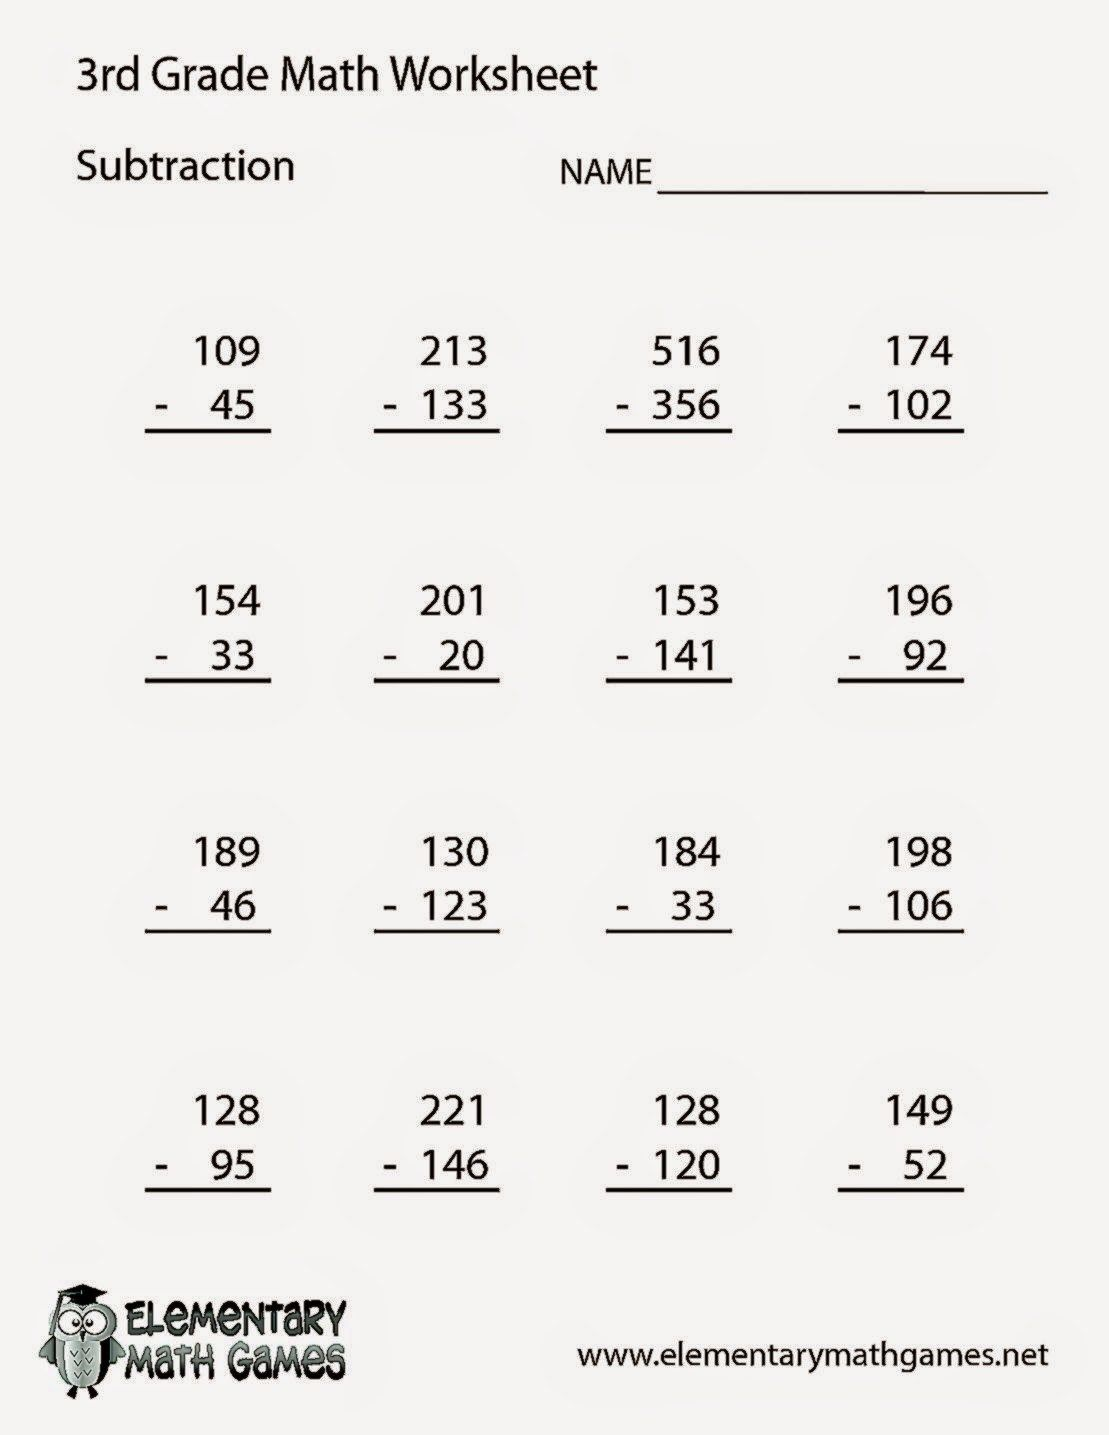 hight resolution of 7th Grade Math Homework Worksheet Printable Worksheets And   3rd grade math  worksheets